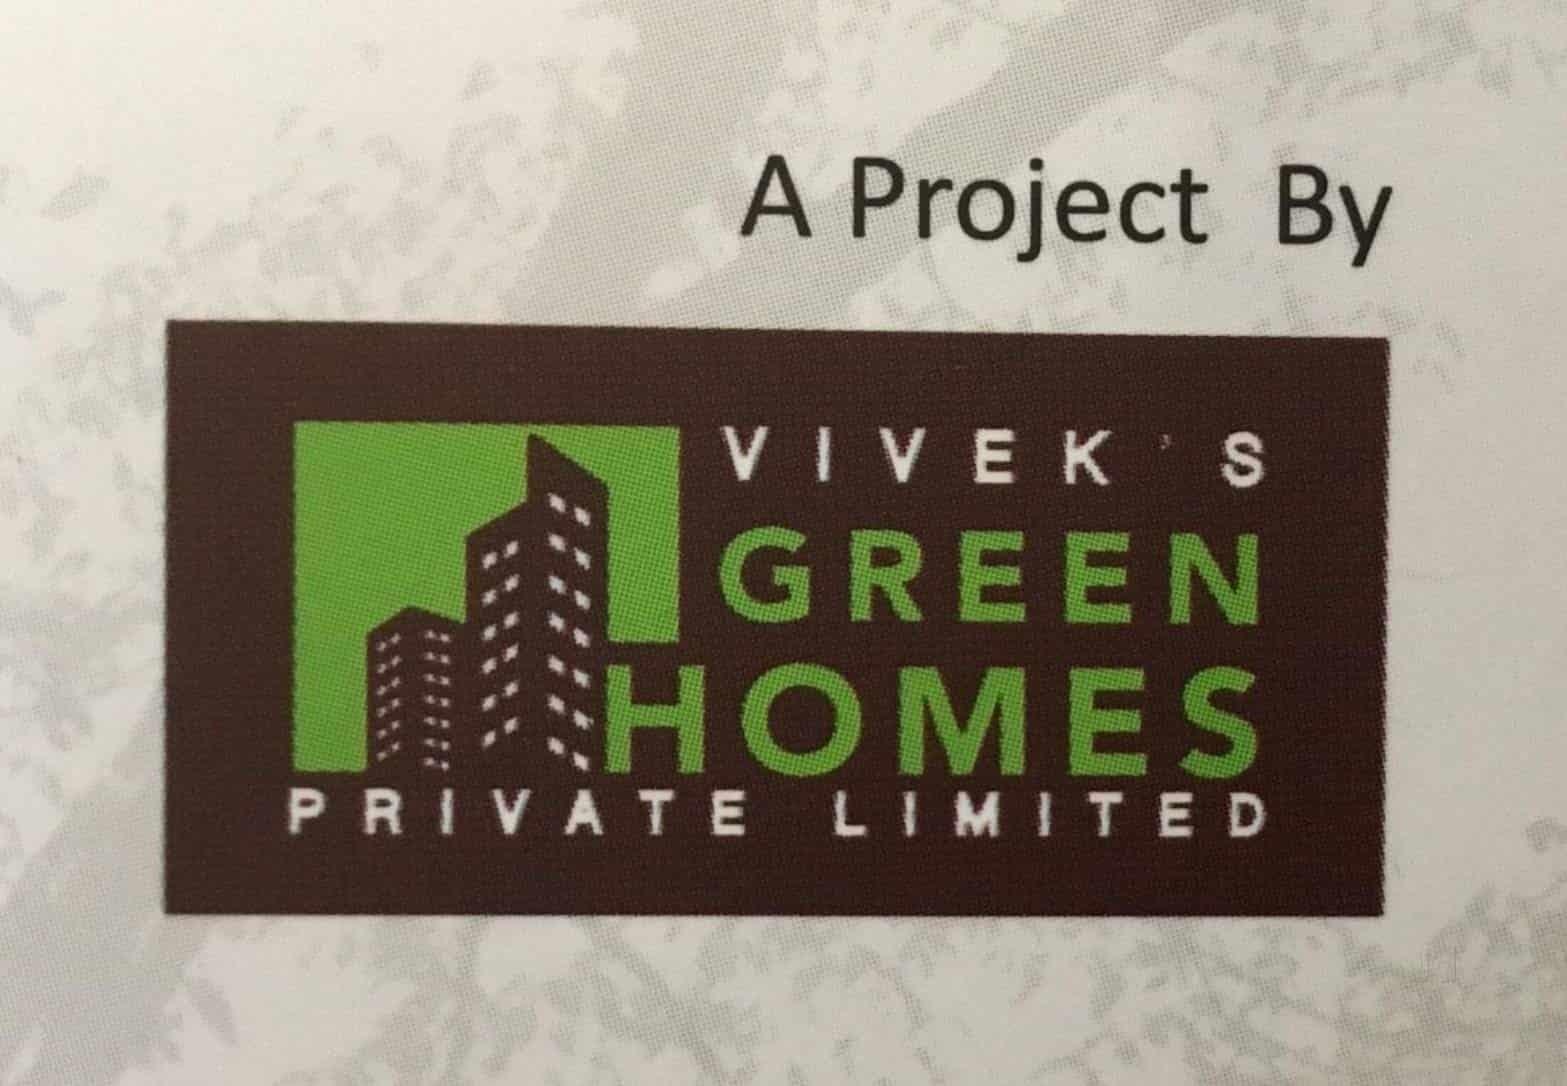 Vivek S Green Homes Pvt Ltd, Alwal - Construction Companies